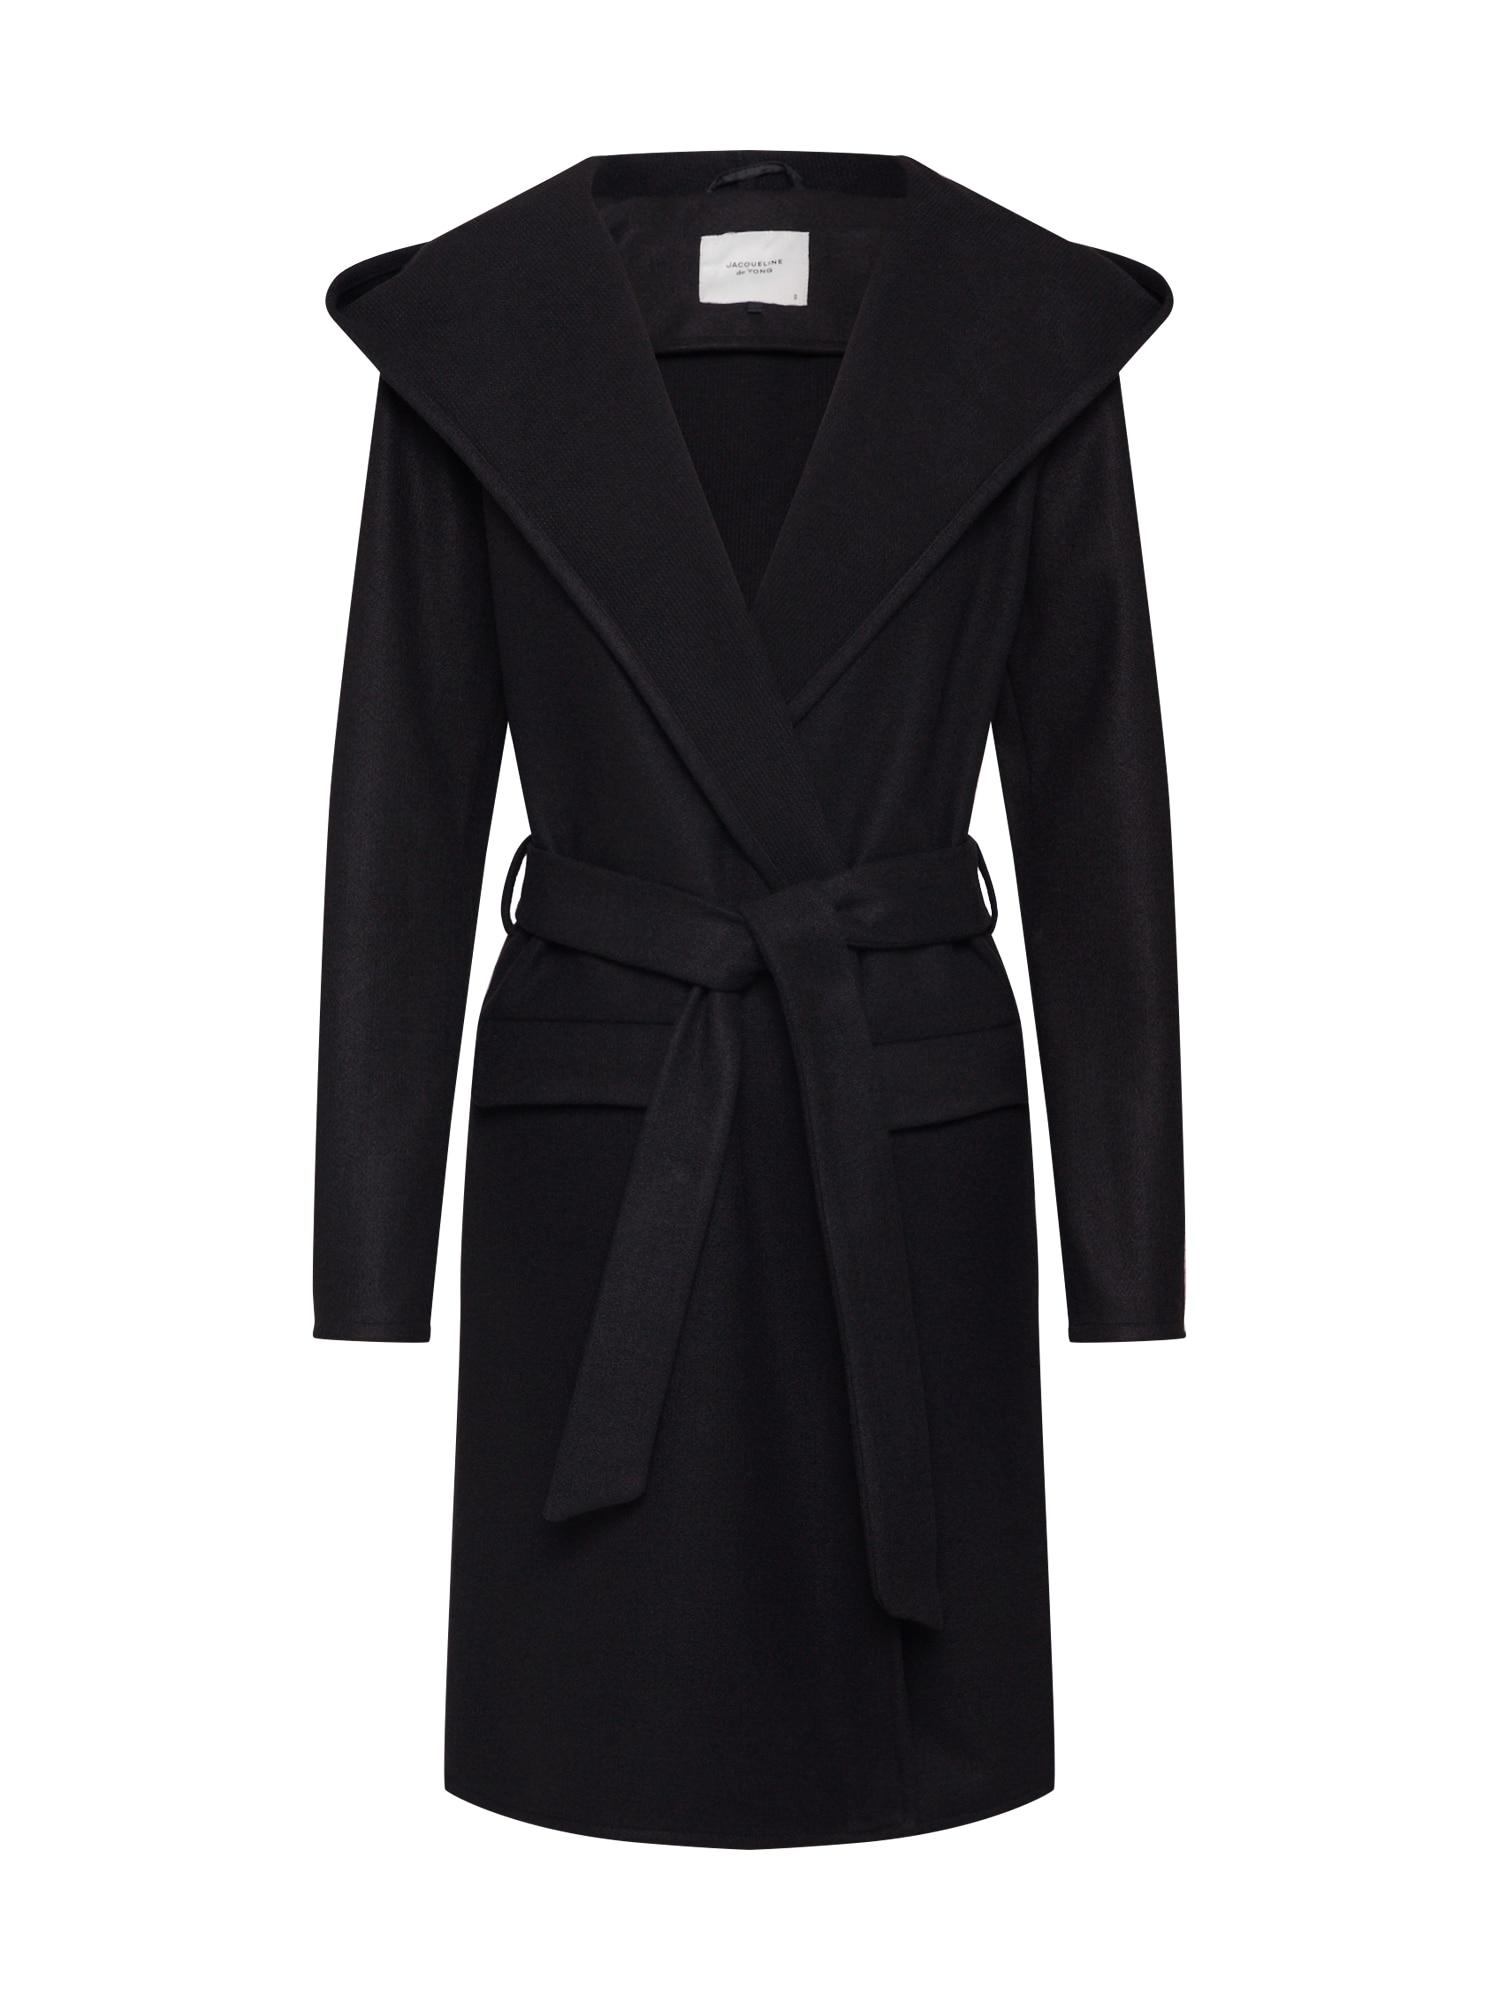 JACQUELINE de YONG Prechodný kabát 'JDYOVIDA '  čierna